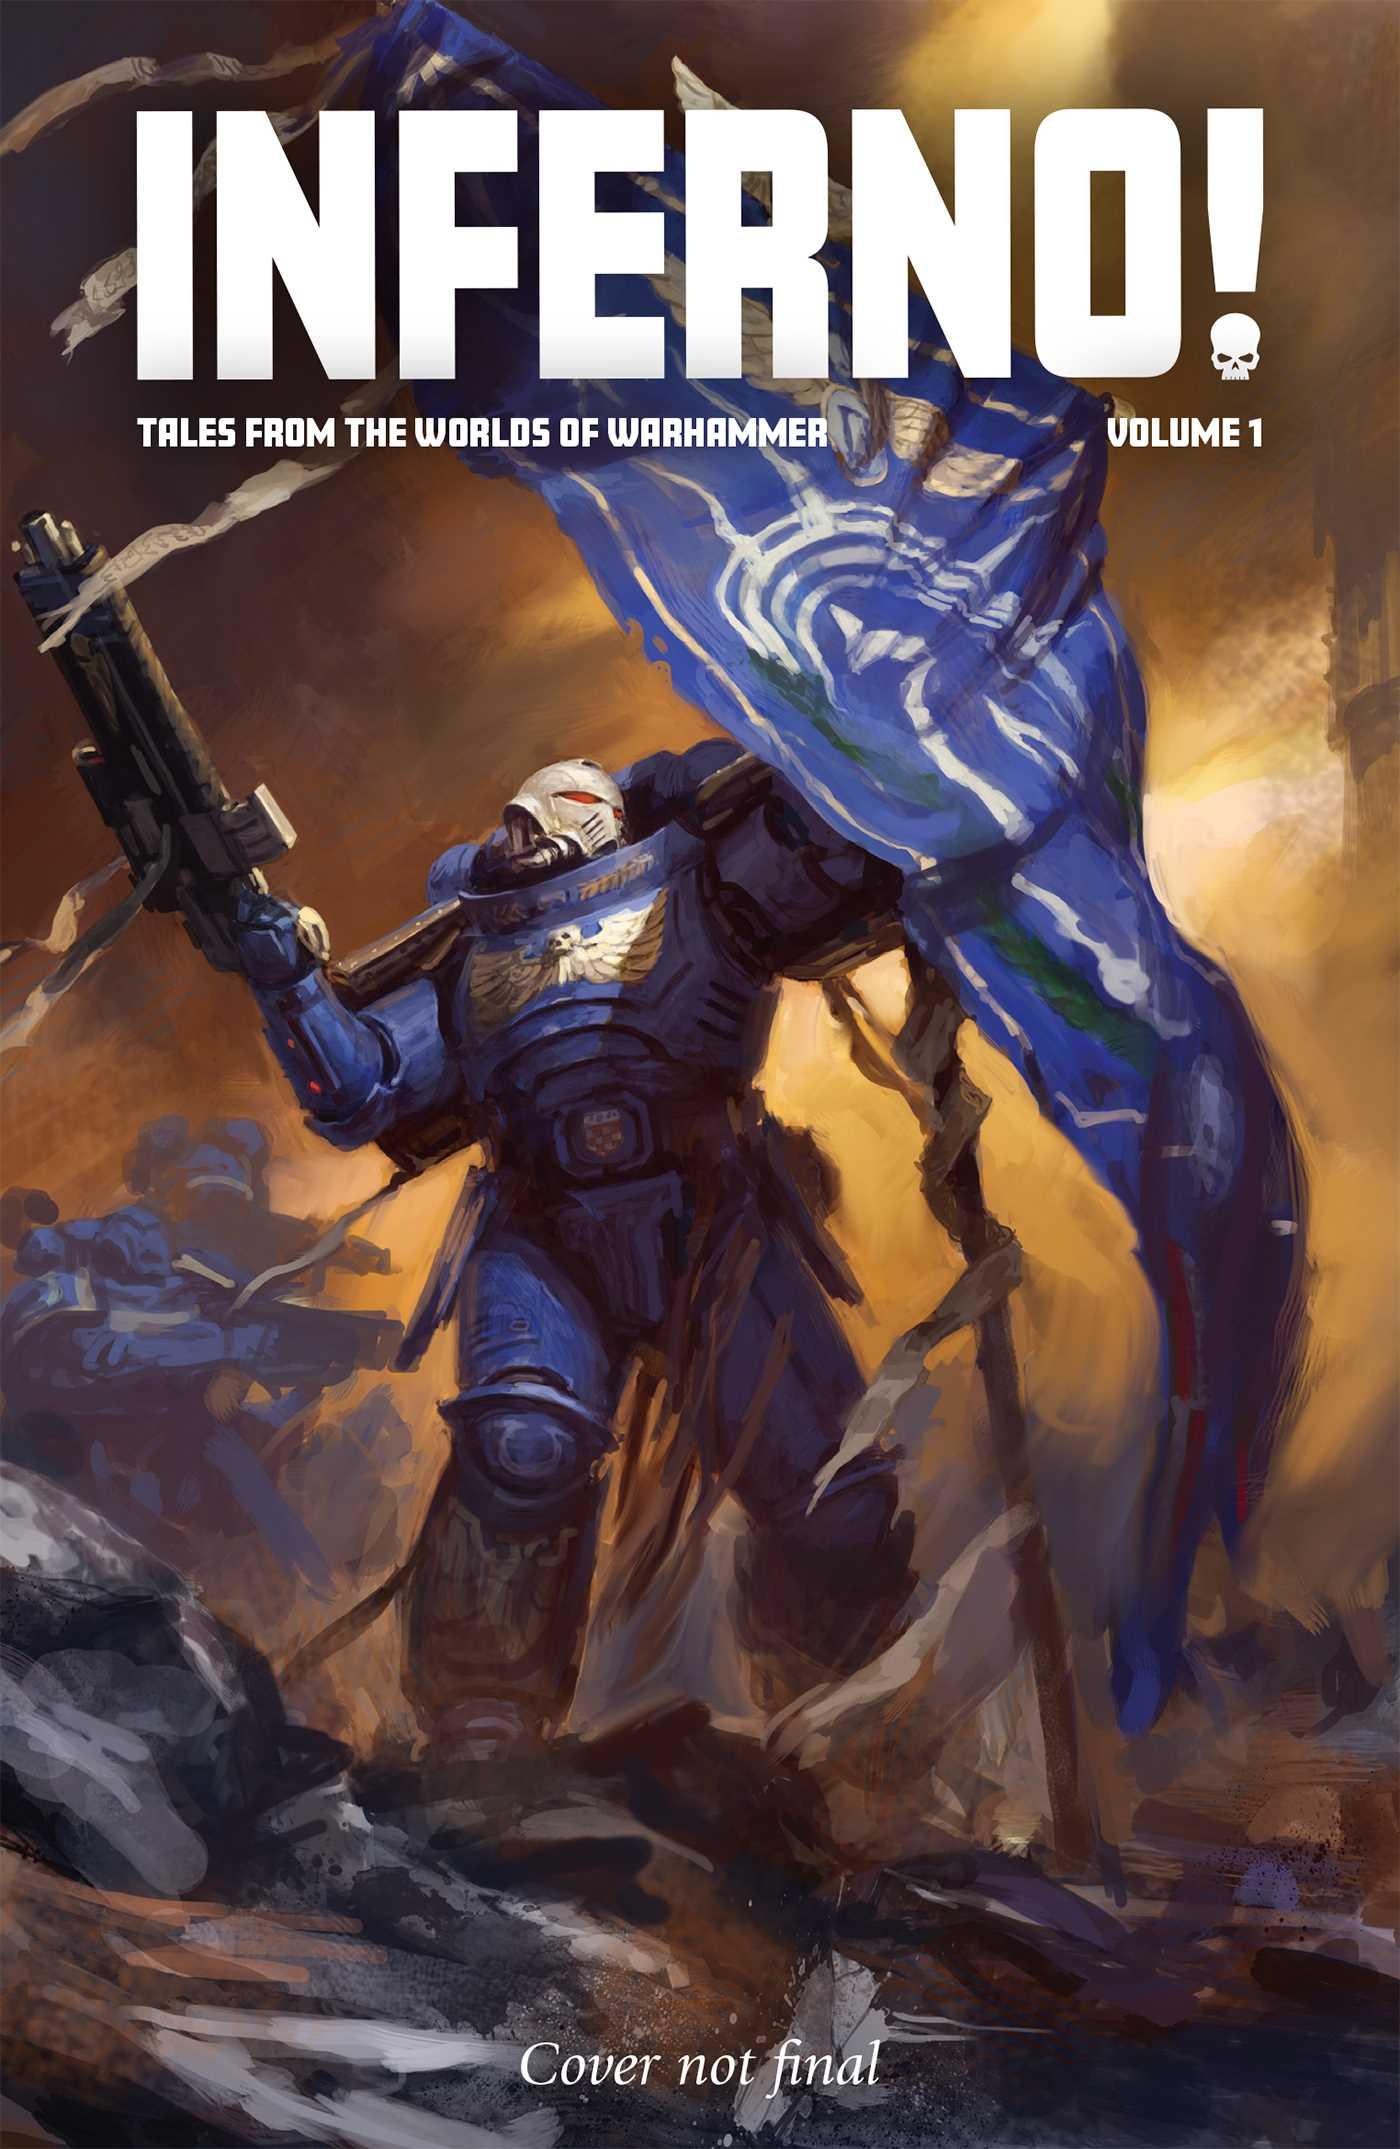 Inferno! Volume 1   Book by David Annandale, Josh Reynolds ...